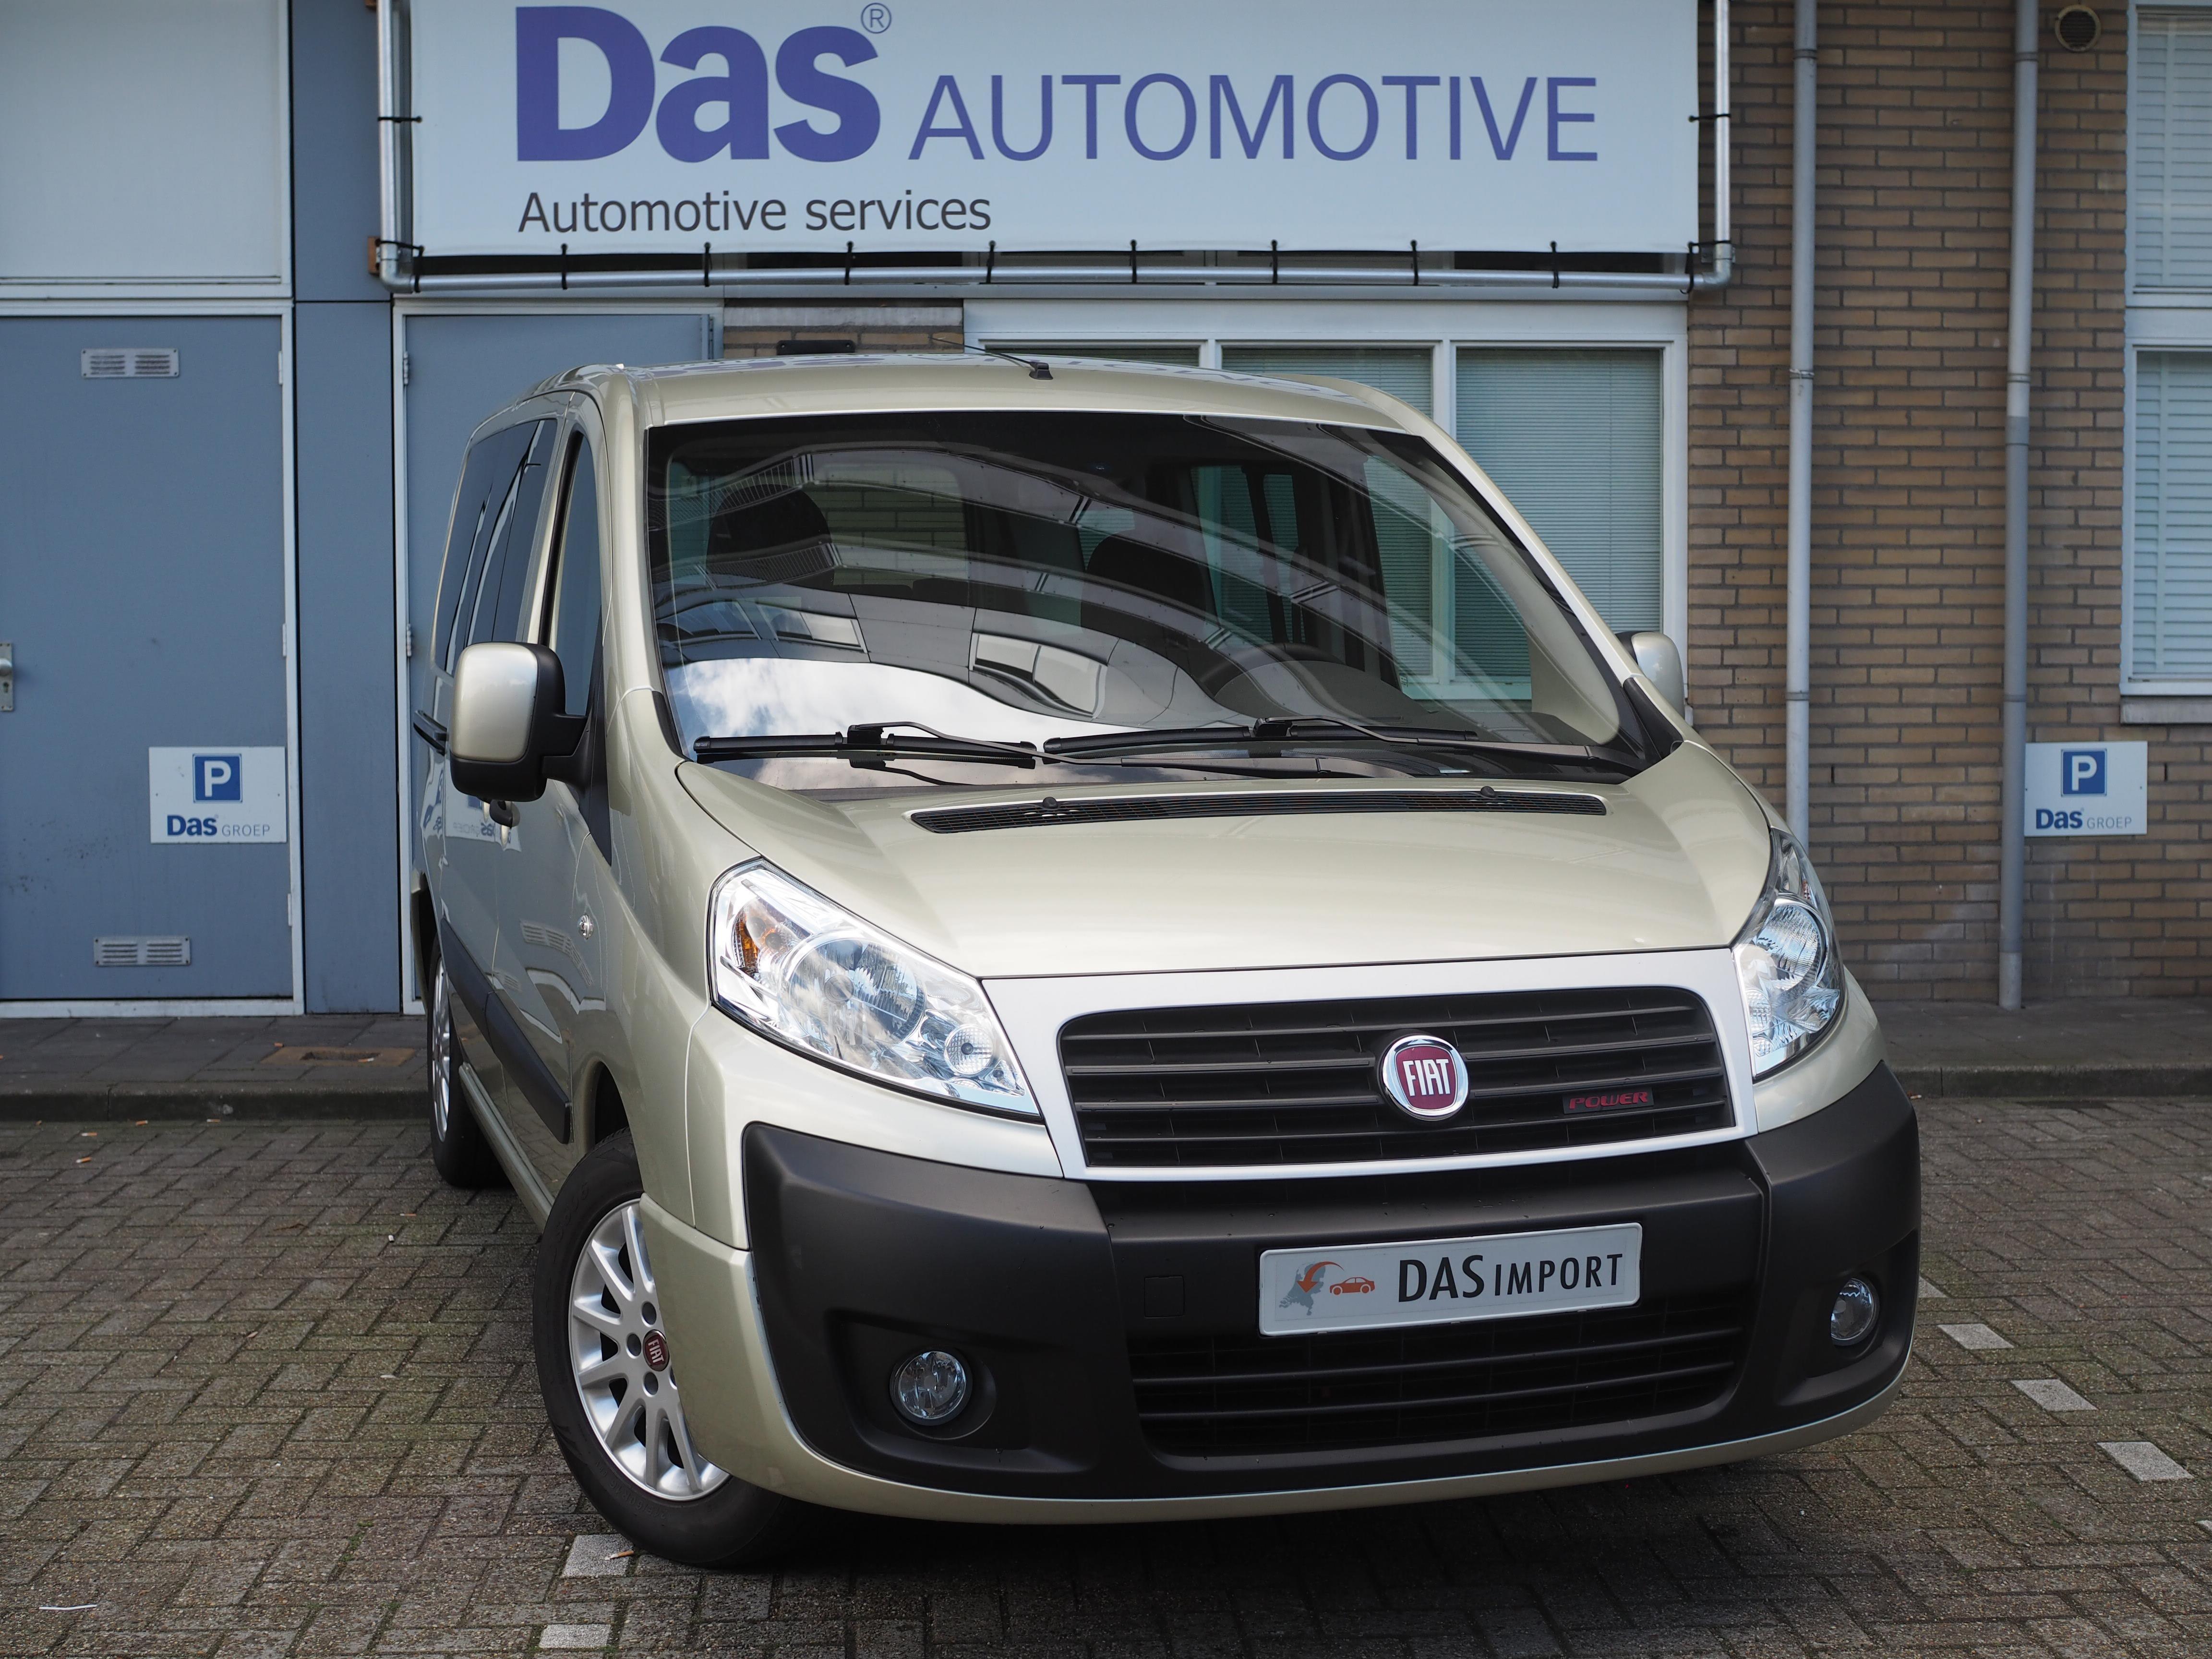 Importauto: Fiat Scudo Diesel 2.0 MJet L1H1 Pan. Exe. 120kW 3/2014